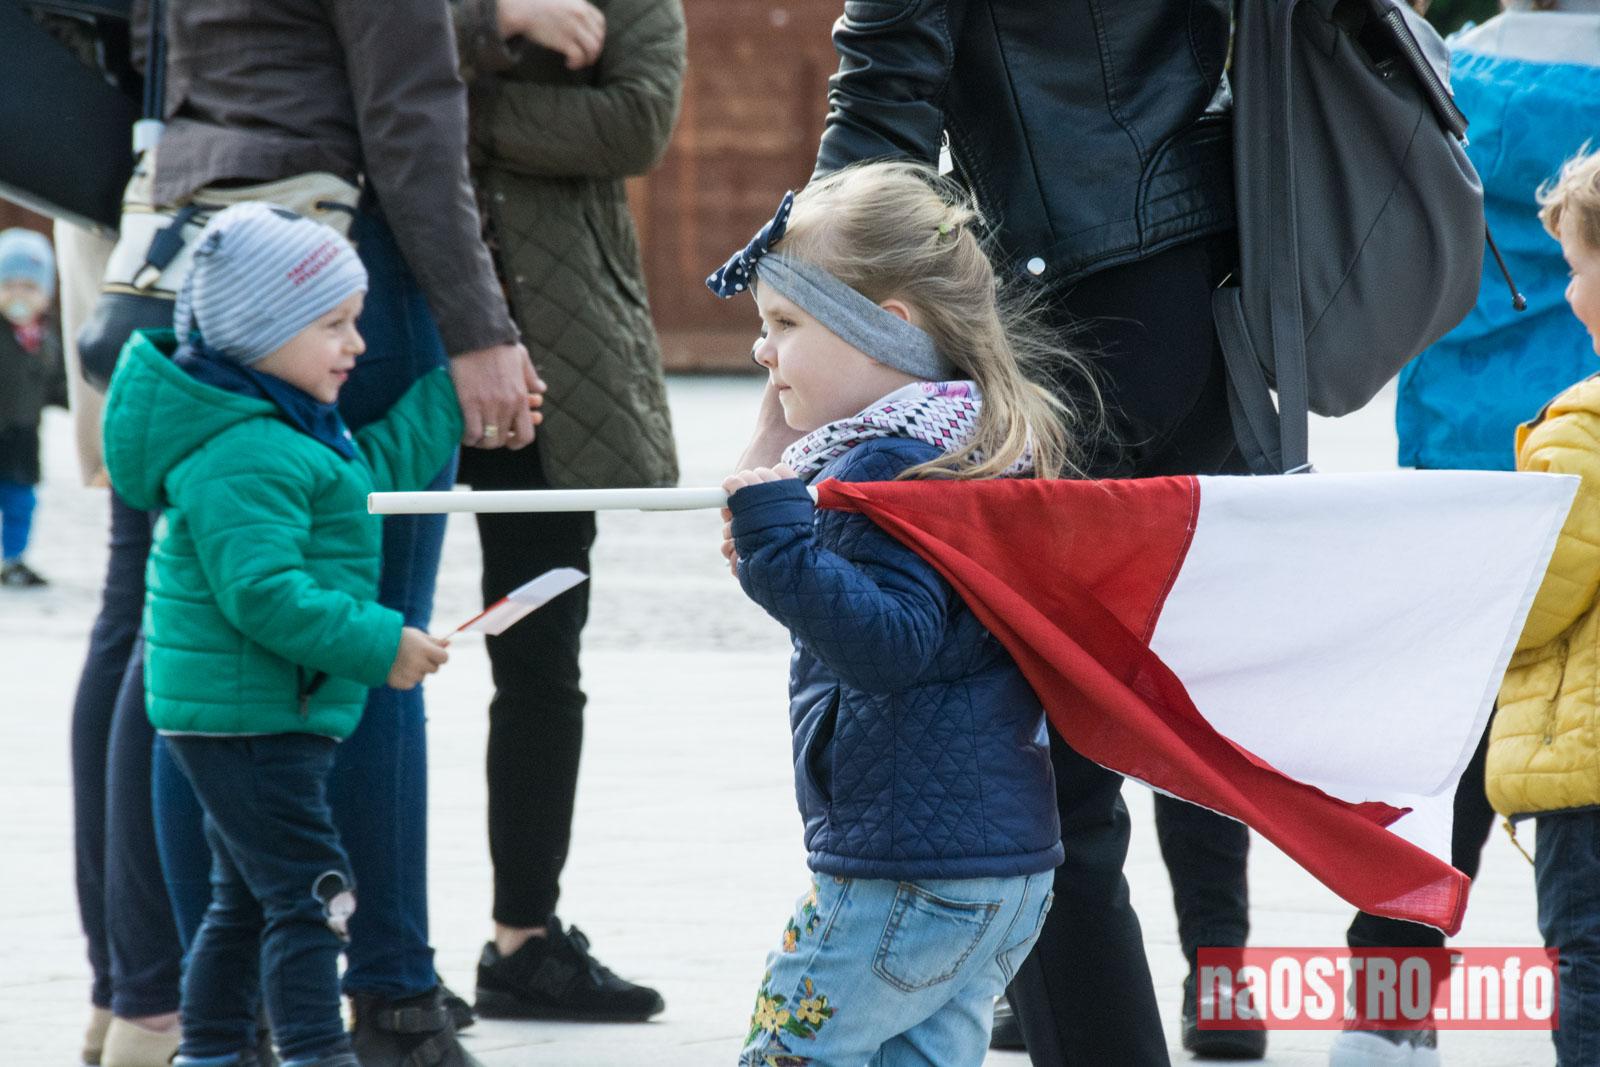 NaOSTRO dzien flagi rynek-3